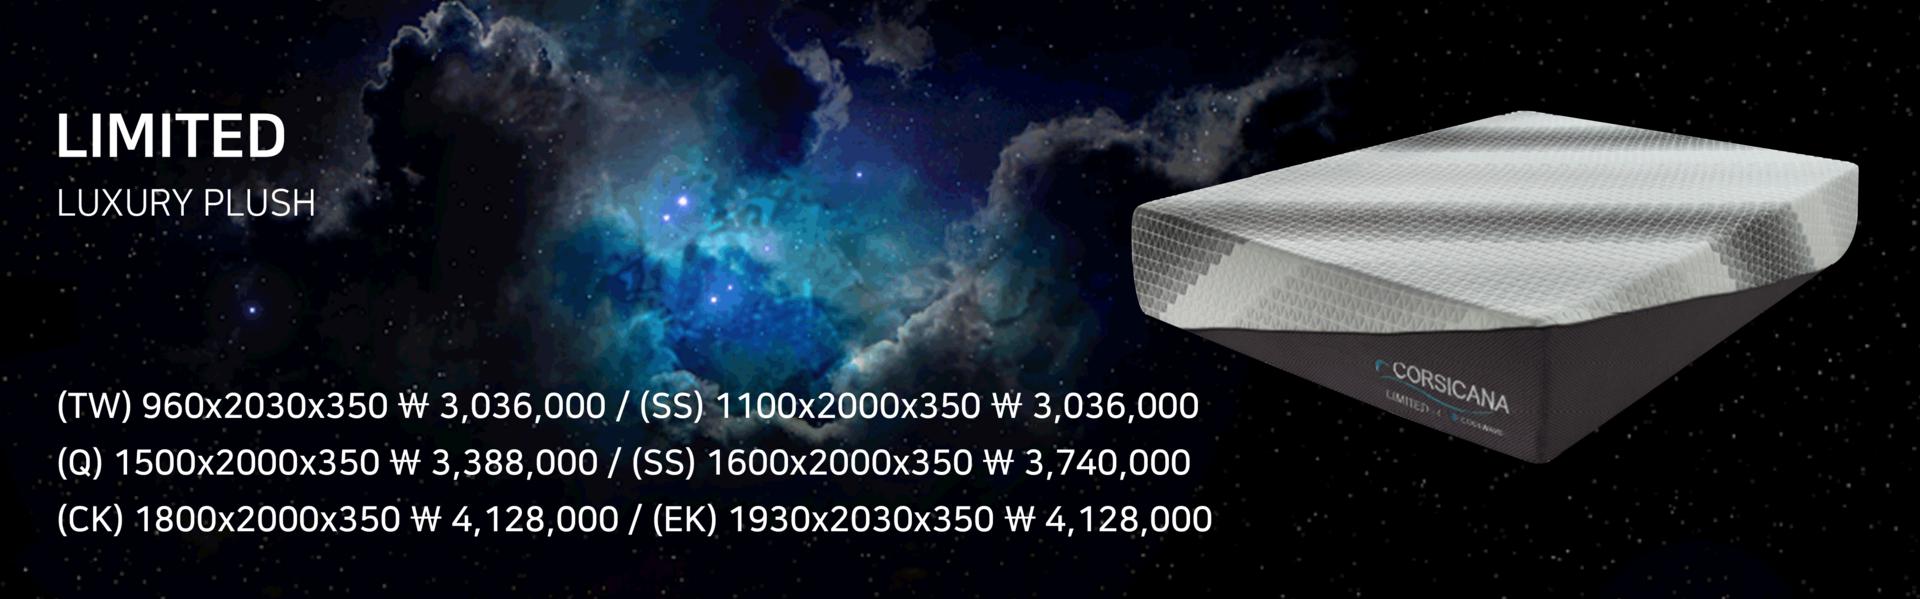 "<font size=""3px""><b>LIMITED<b></font><BR><FONT SIZE=""1PX"">LUXURY PLUSH</FONT> <BR><br><font size=""0.5px""> (TW) 960x2030x350 ₩3,036,000  /  (SS) 1100x2000x350 ₩3,036,000 <br> (Q) 1500x2000x350 ₩3,388,000  /  (K) 1600x2000x350 ₩3,740,000    <br>(CK) 1800x2000x350 ₩4,128,000  /  (EK) 1930x2030x350 ₩4,128,000</font>"